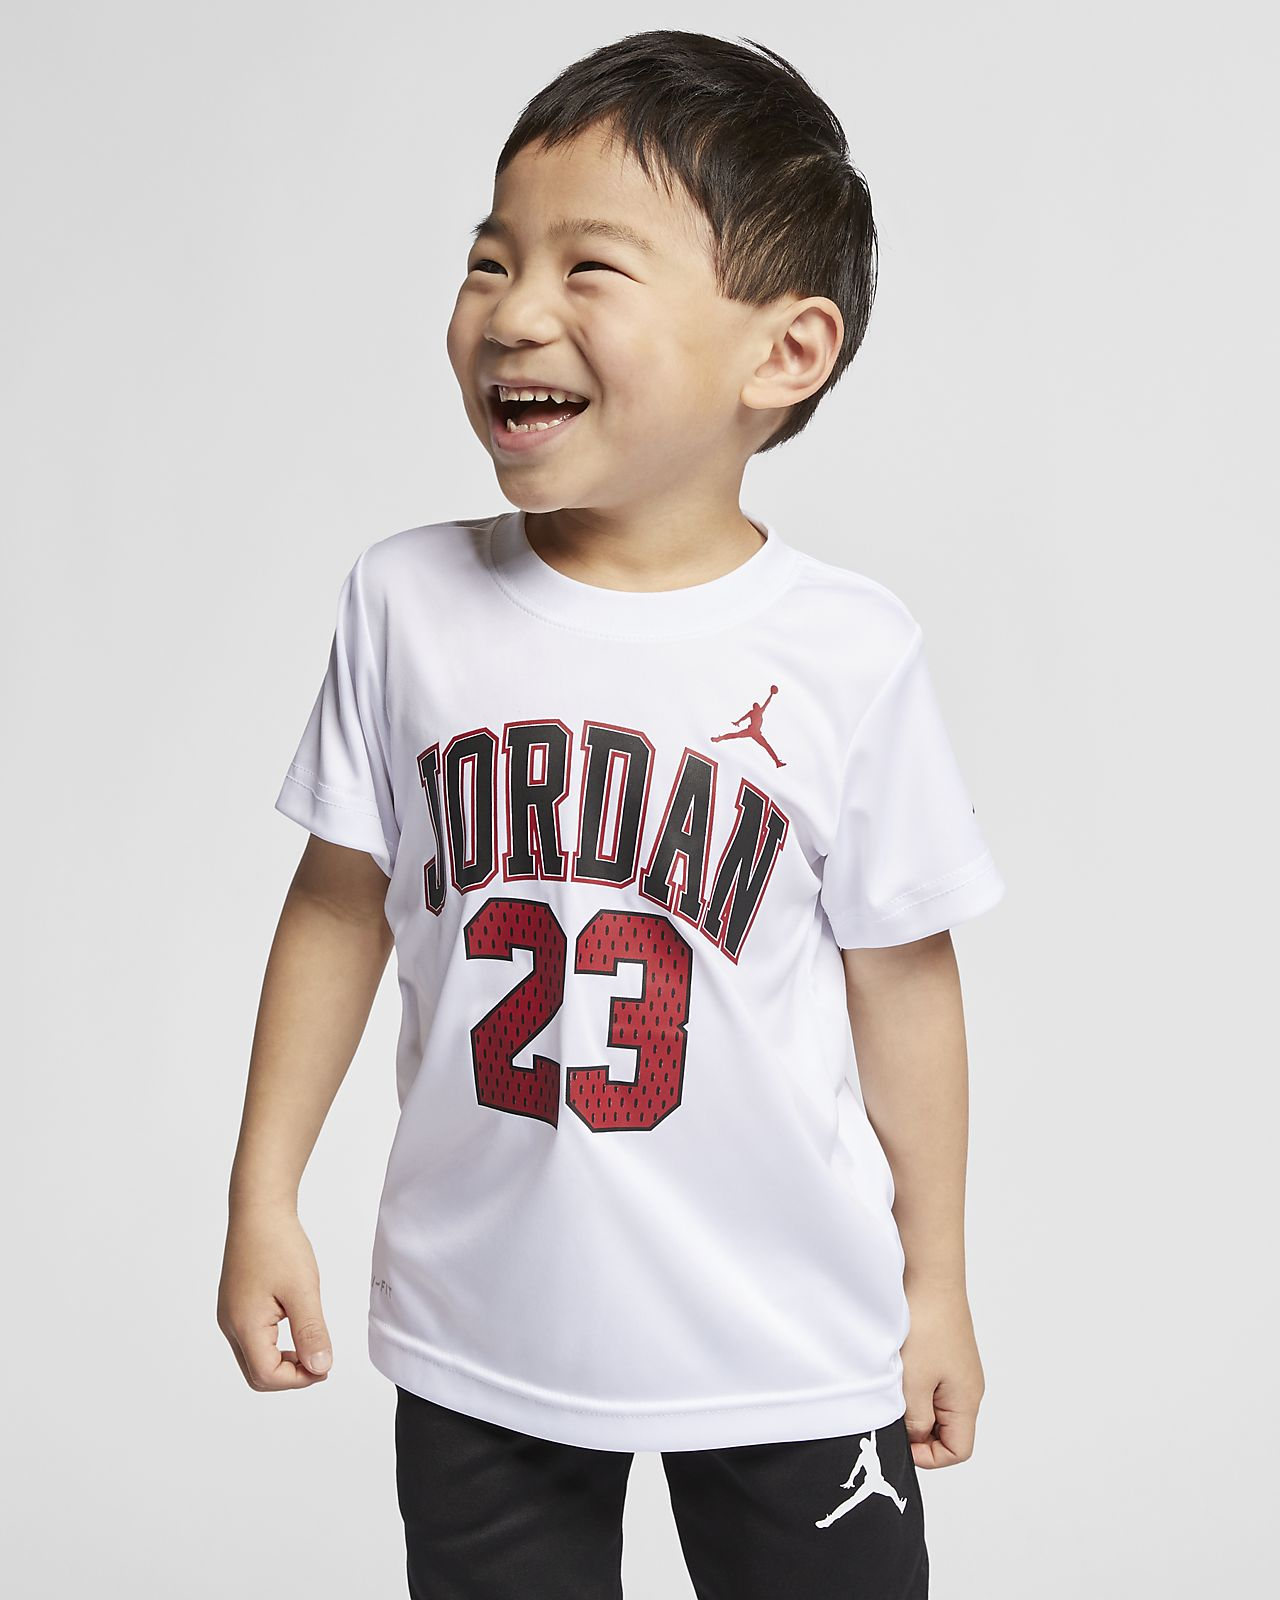 Jordan Dri-FIT 23 Younger Kids' Graphic T-Shirt